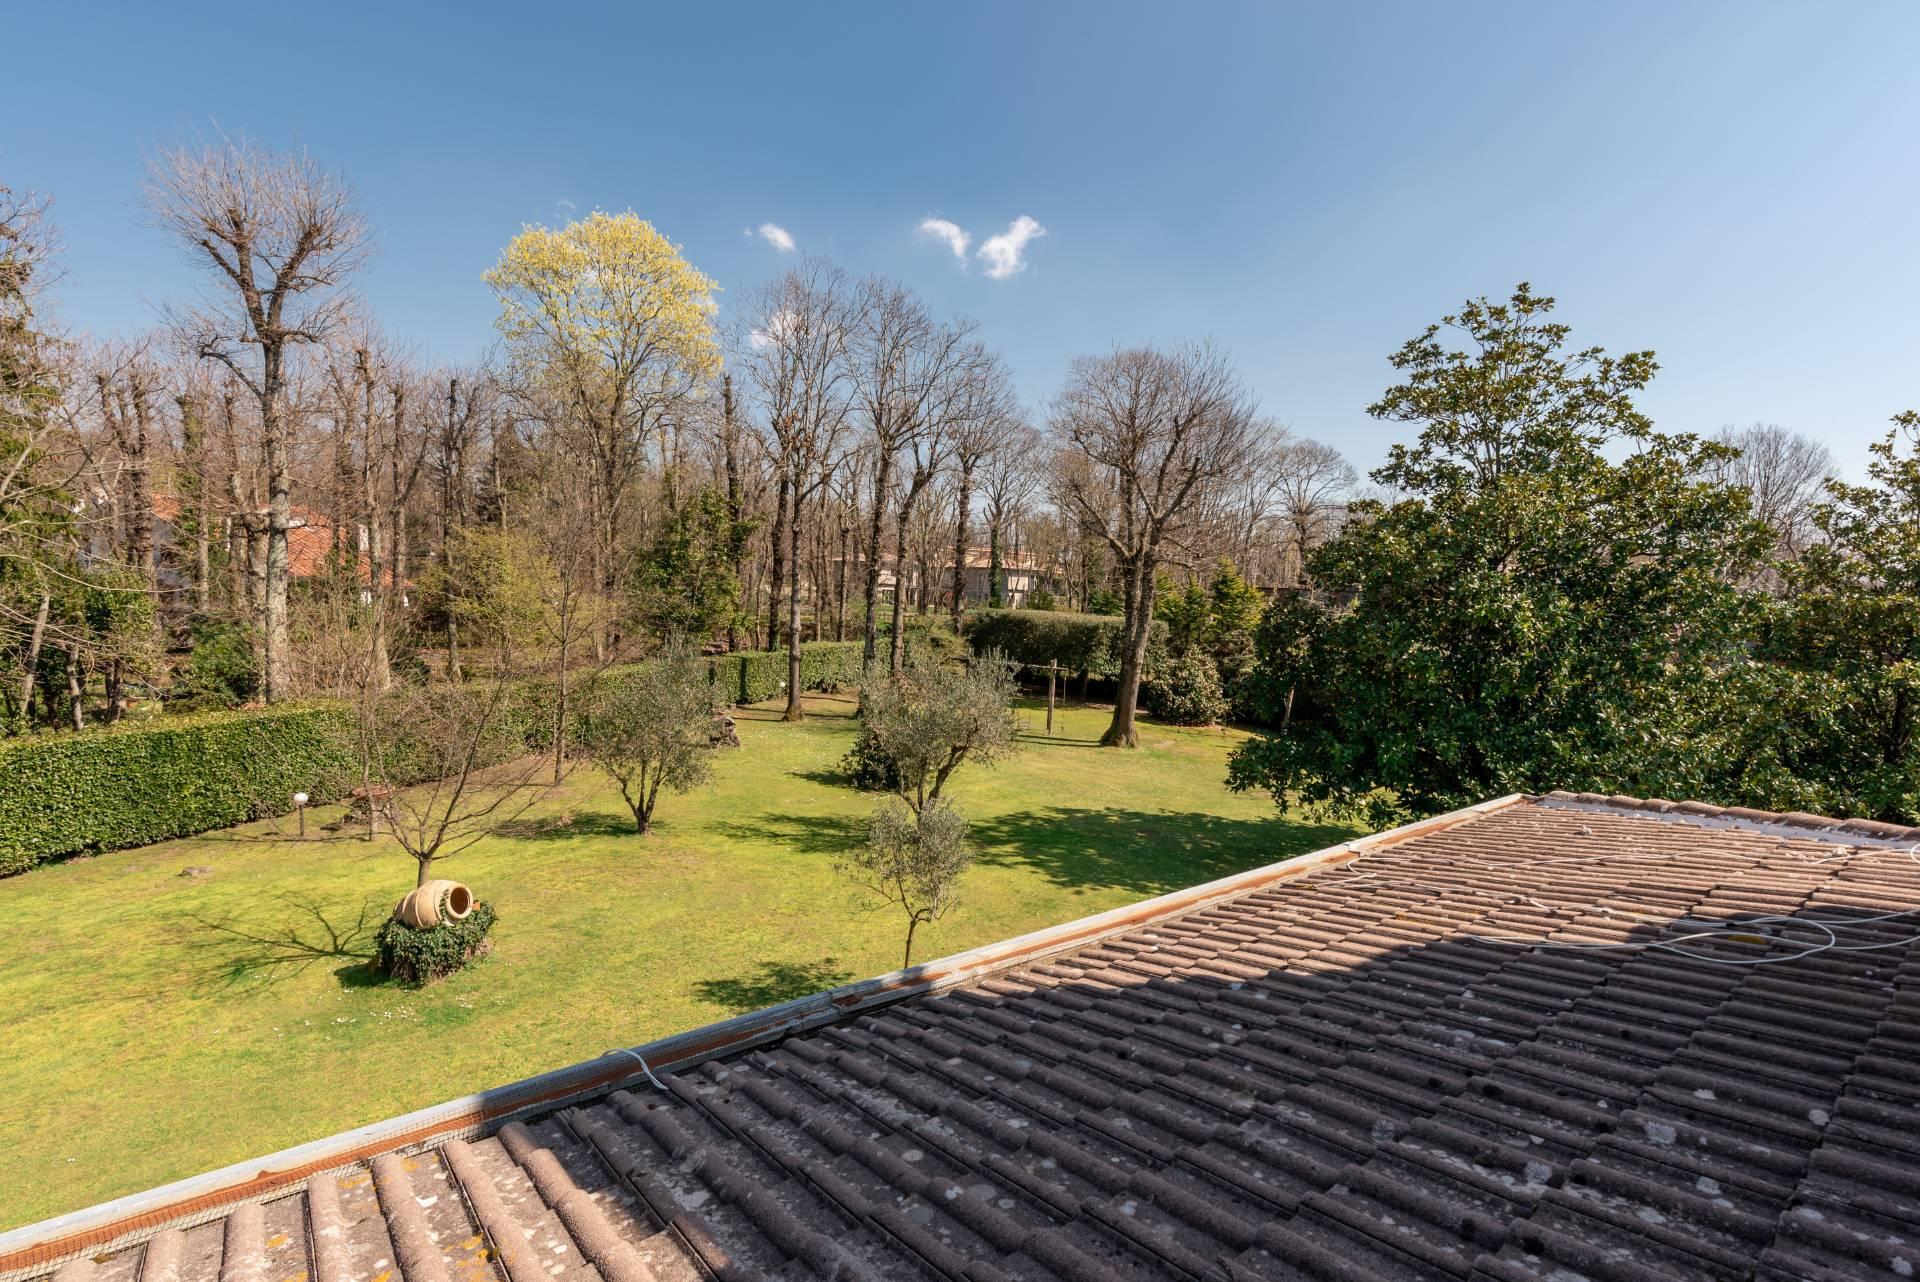 Villa in Vendita a Ariccia: 5 locali, 583 mq - Foto 13